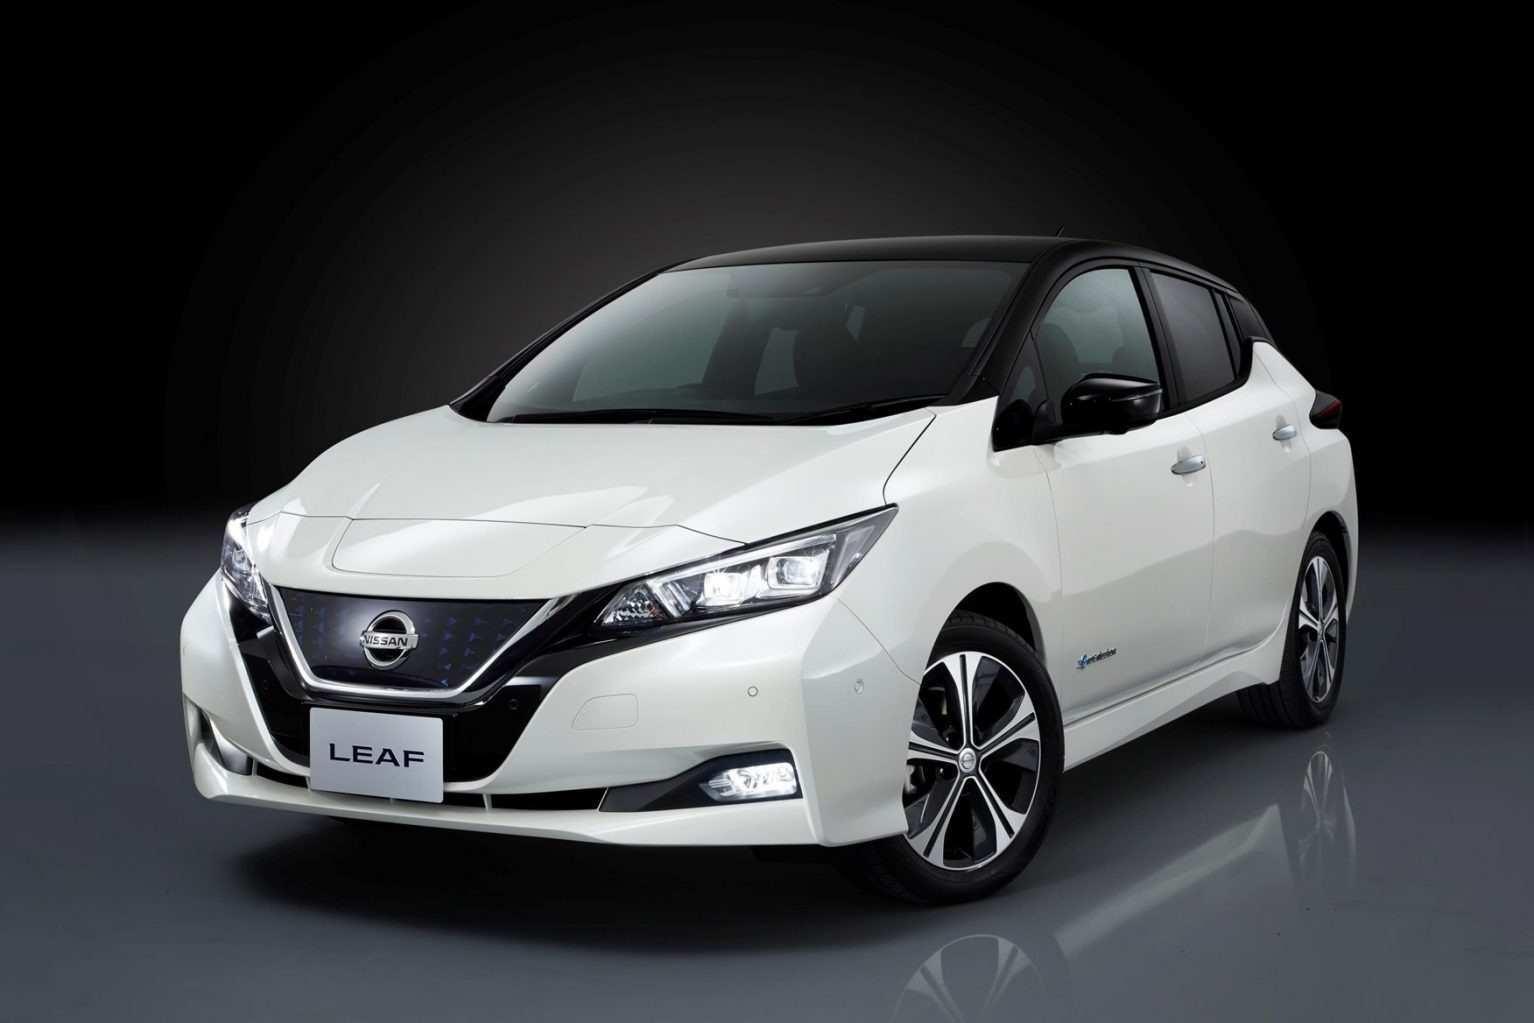 96 Great 2020 Nissan Leaf Price Interior for 2020 Nissan Leaf Price